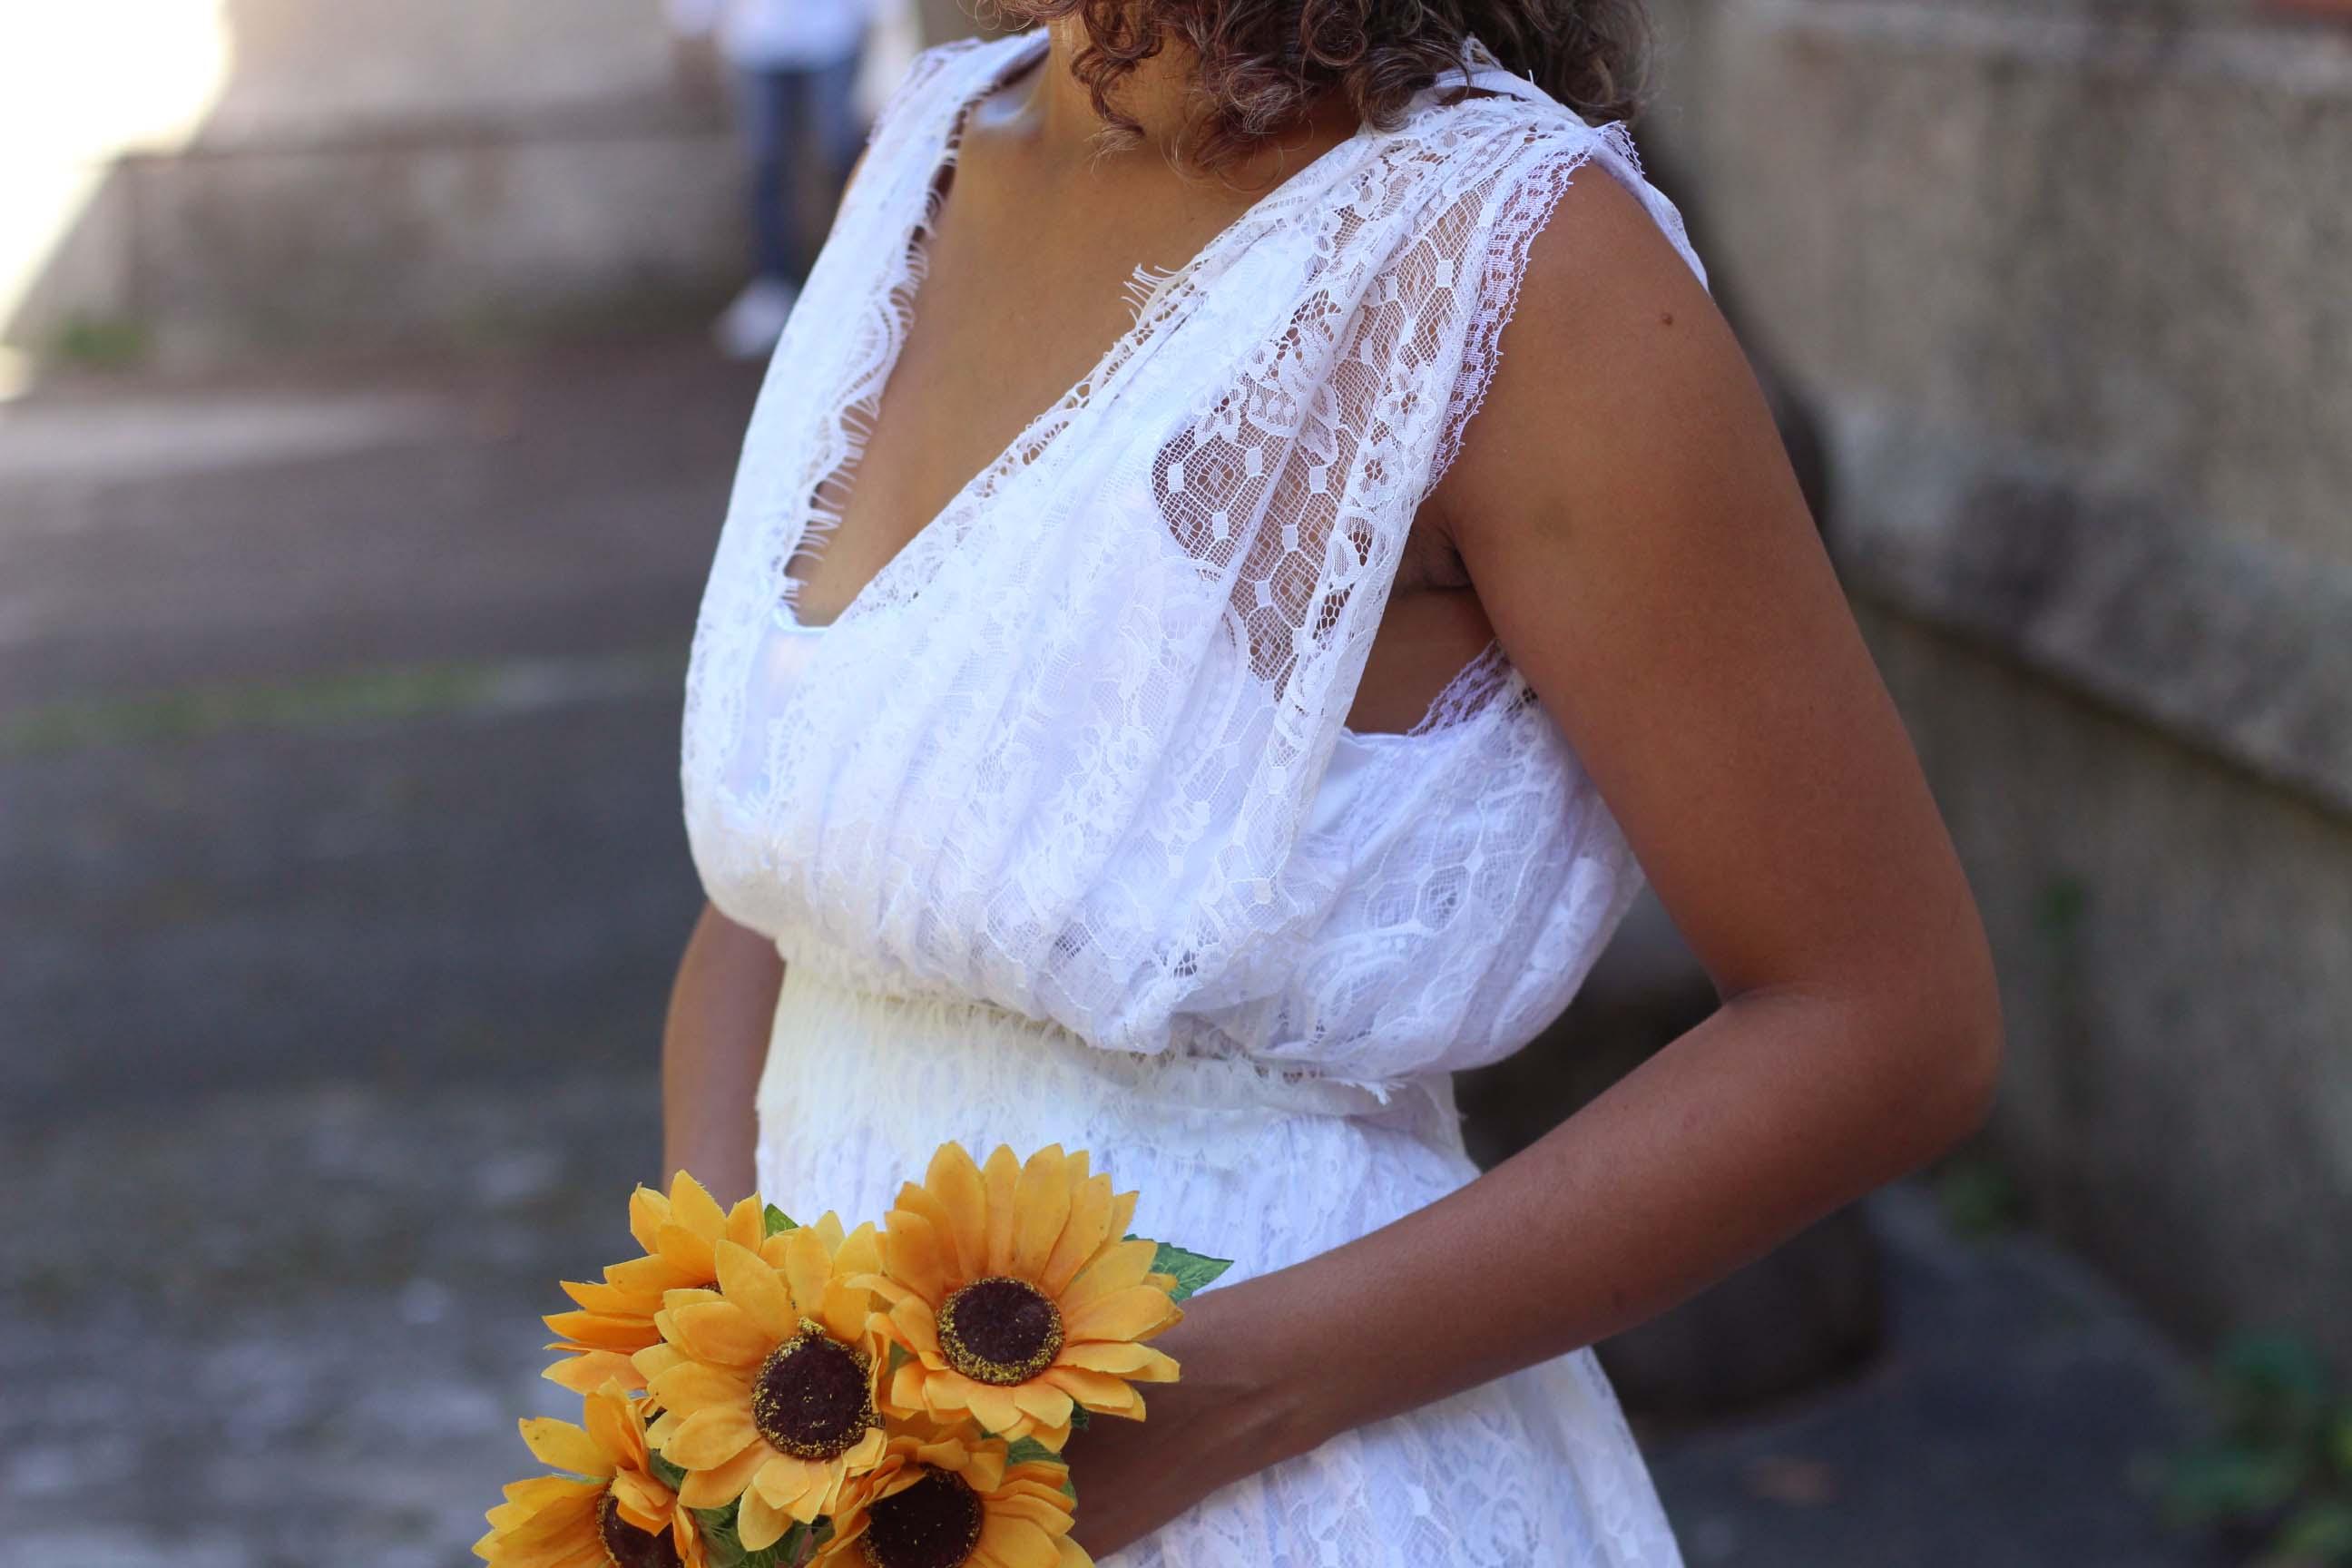 dayse costa,vestido de noiva,vestido,dress,wedding,wedding dress,bride,renda,maximus tecidos,boho,vestido para casamento na praia,vestido para casamento no campo,vestido para casamento de dia,vestido boho,vestido simples de noiva,moulage